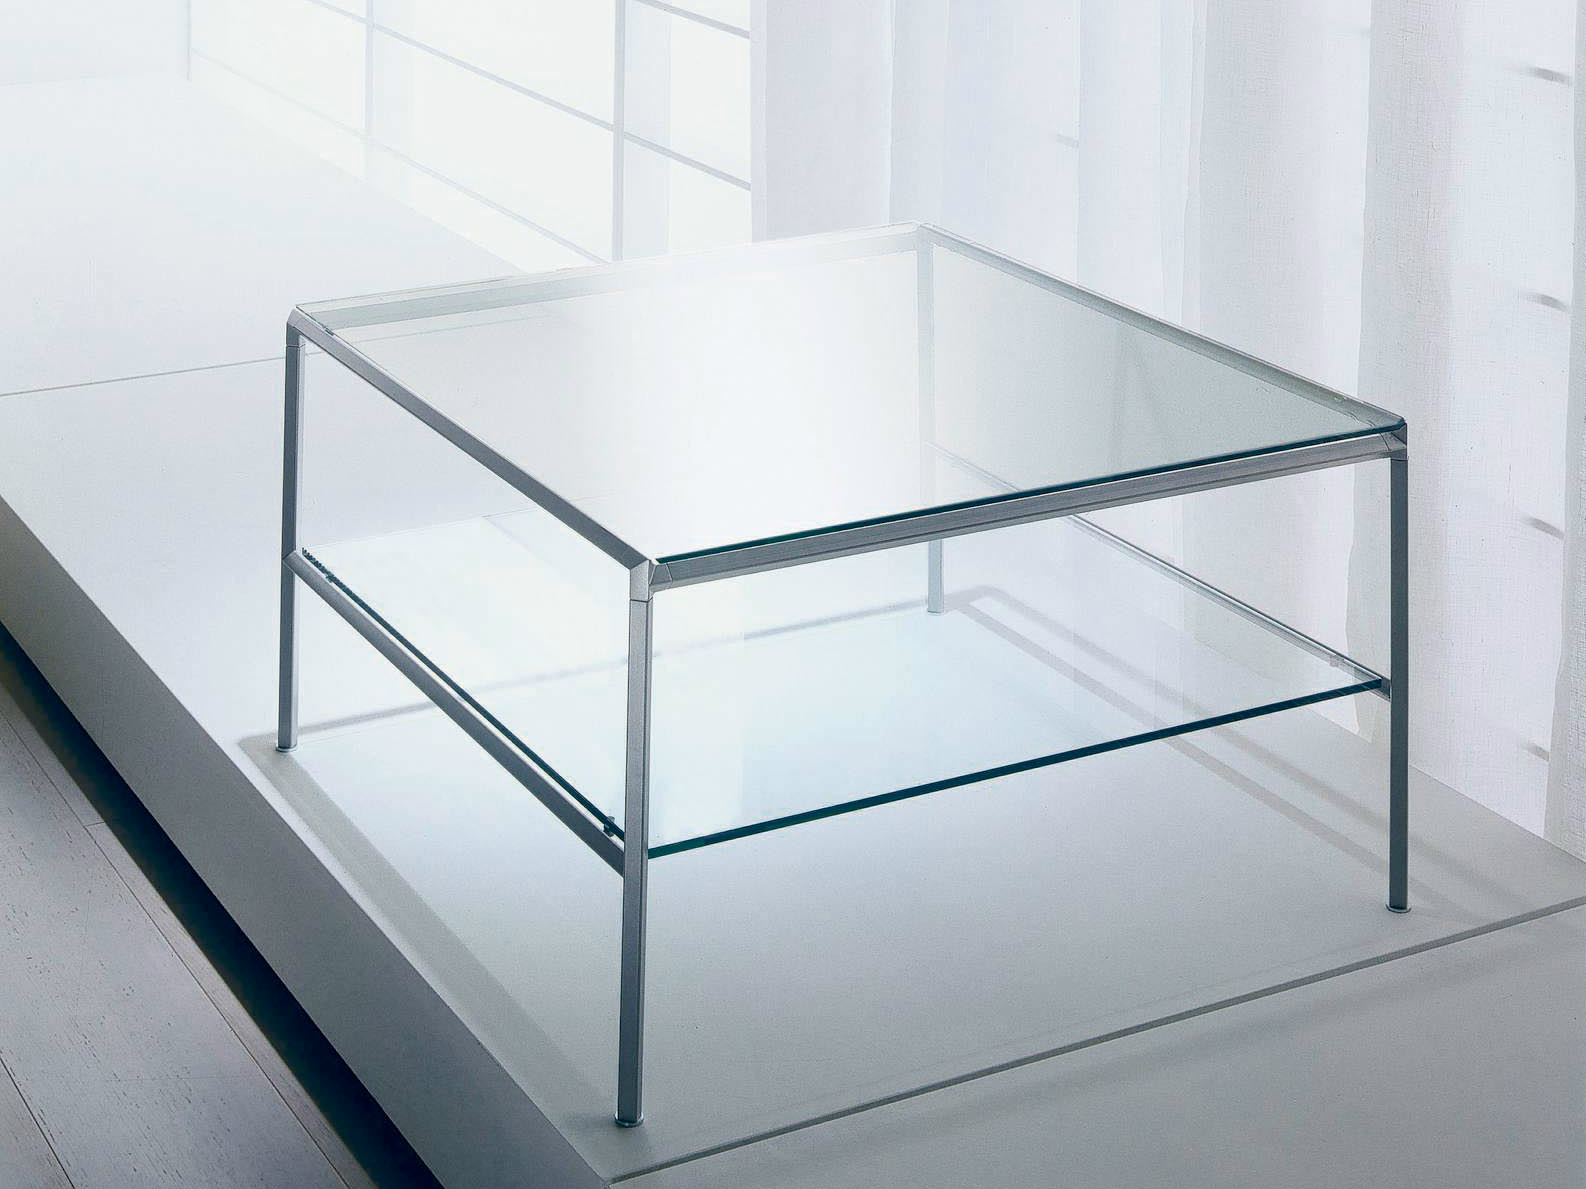 Diagonal tavolino quadrato by bontempi - Tavolini mercatone uno ...